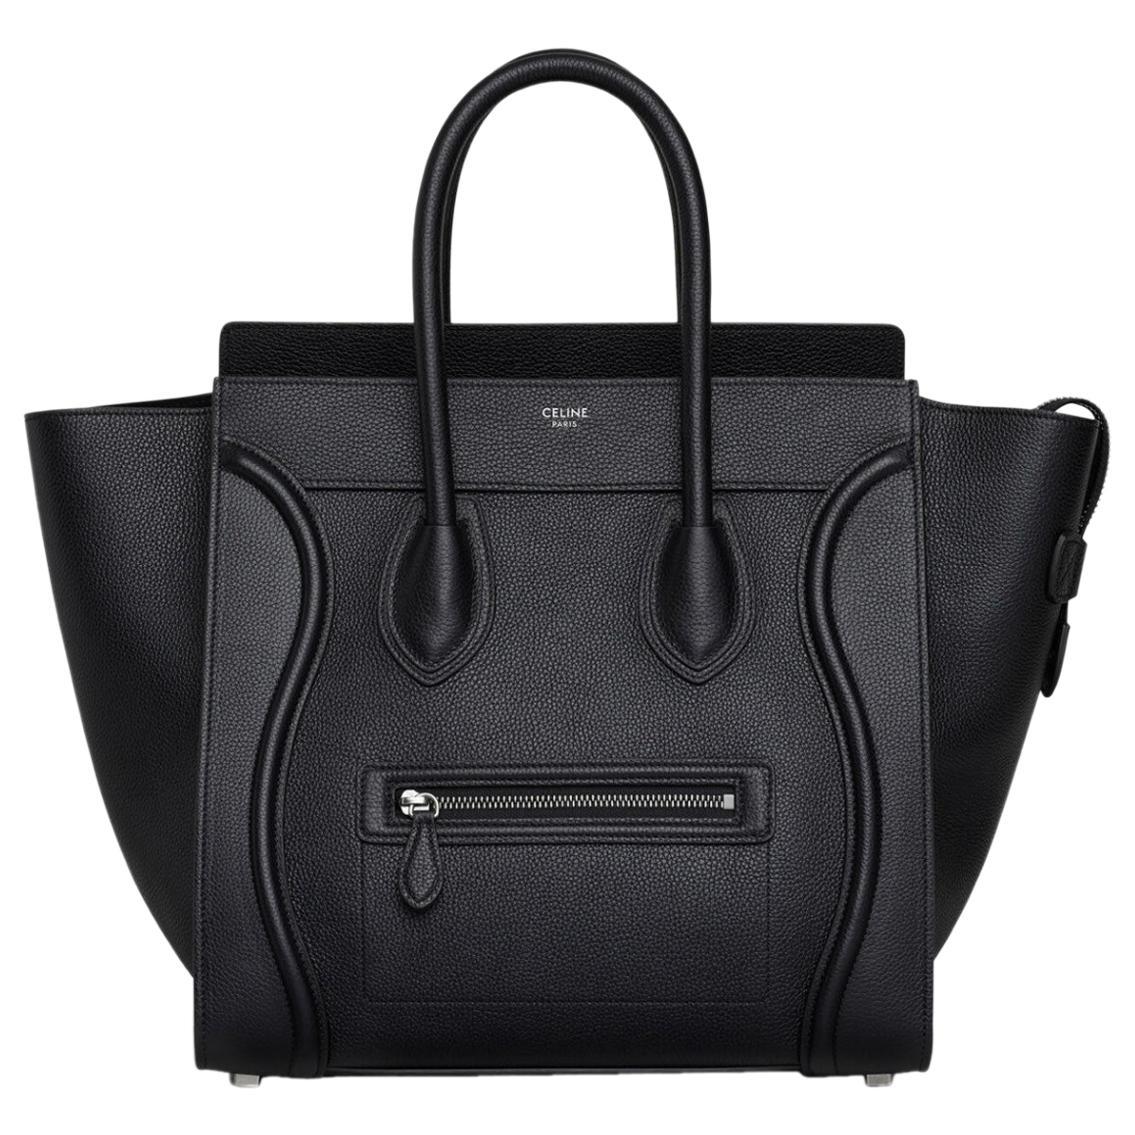 Celine Smooth Black Calfskin   Luggage  Handbag, Excellent Condition